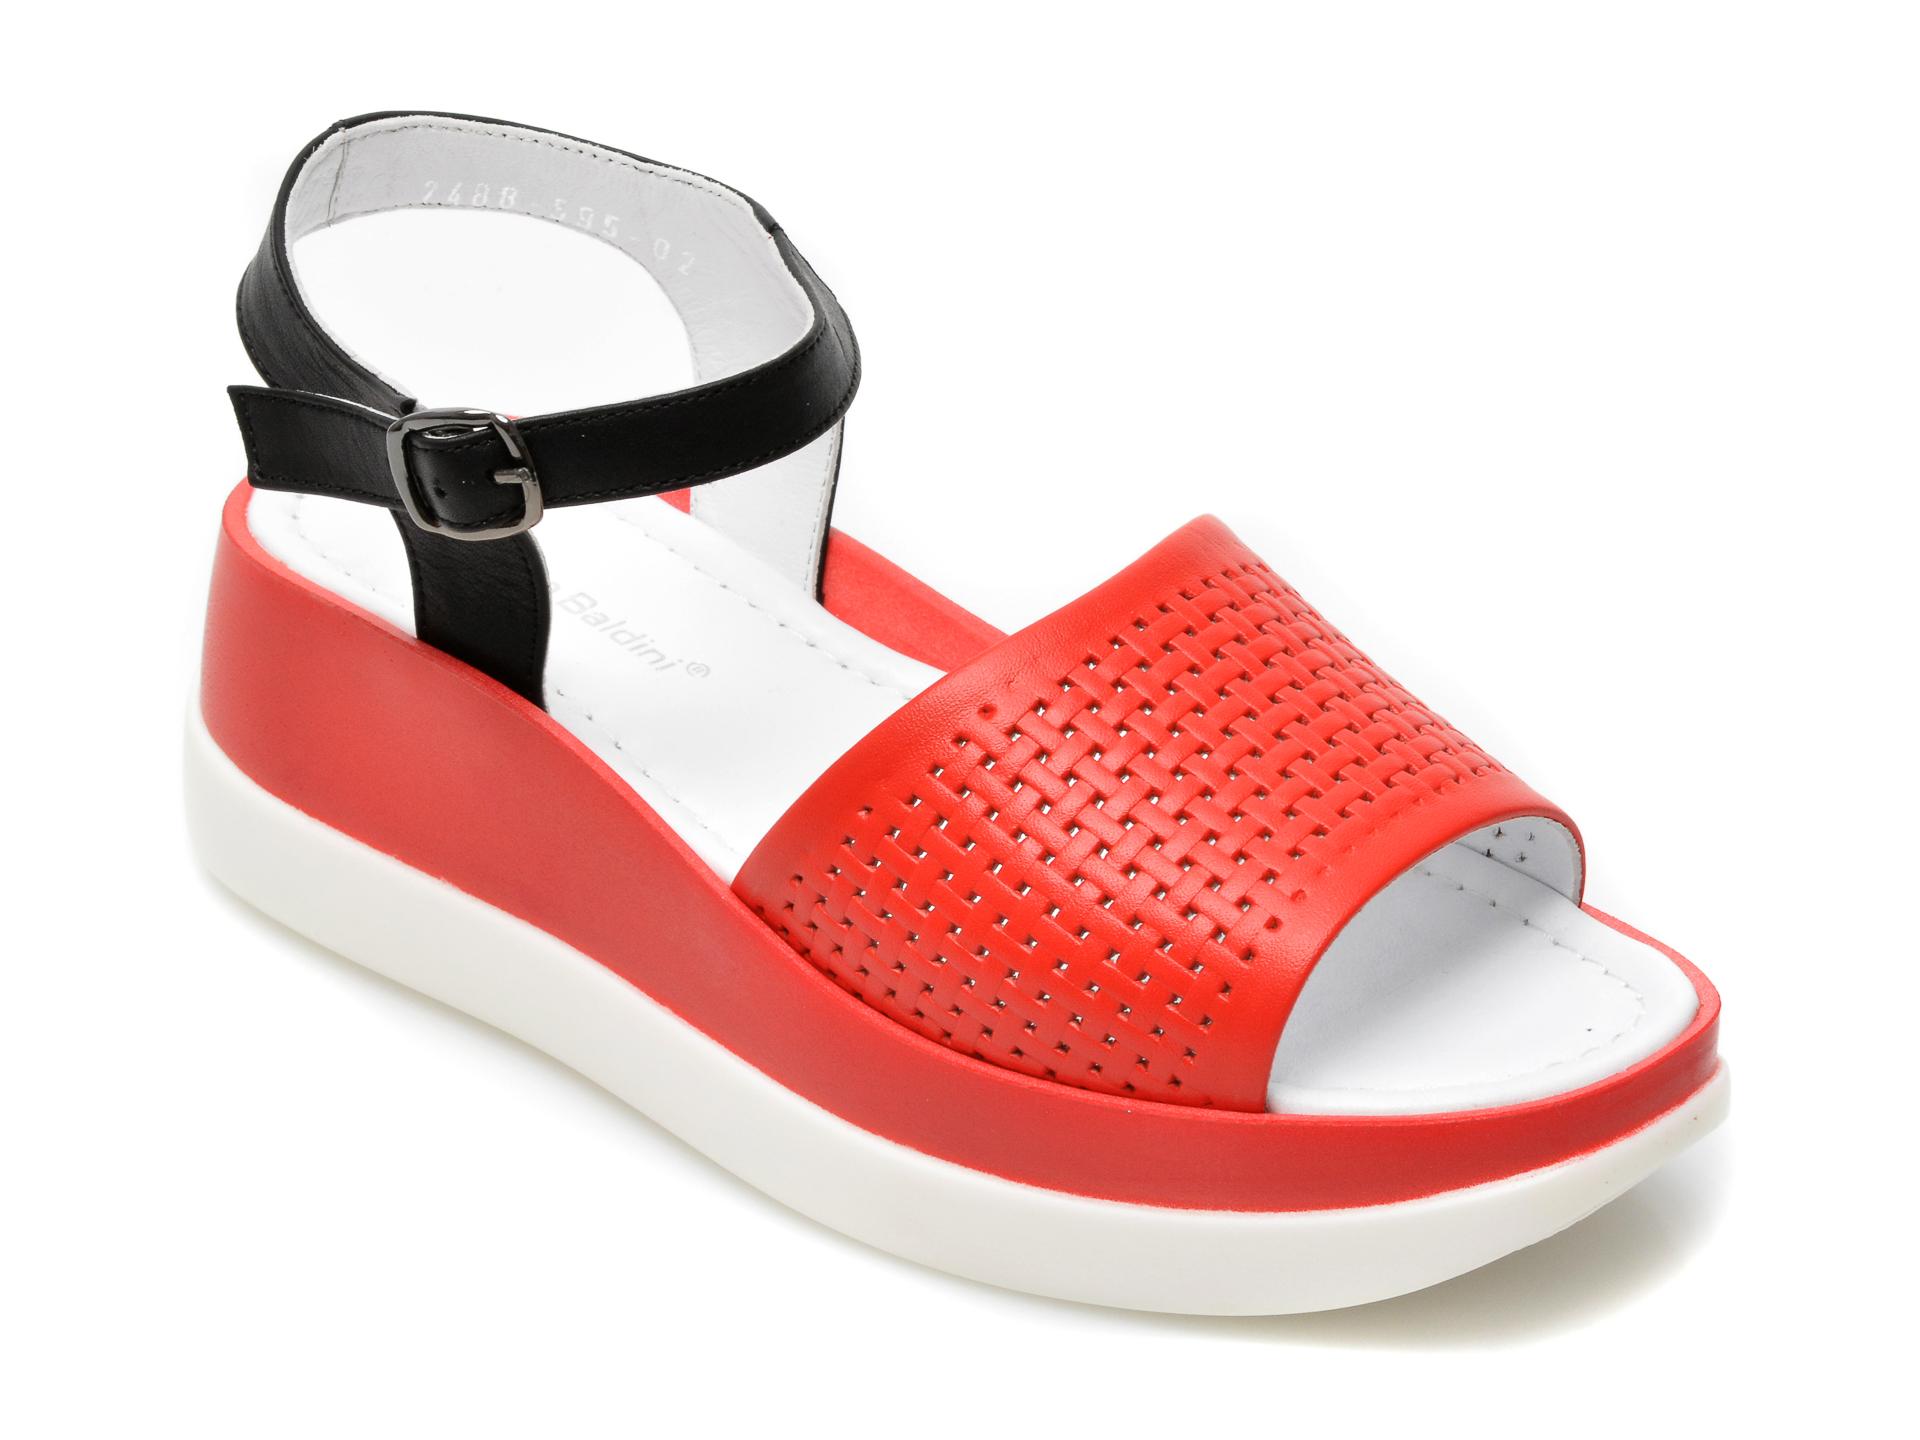 Sandale BENGZO BALDINI rosii, 2441, din piele naturala imagine otter.ro